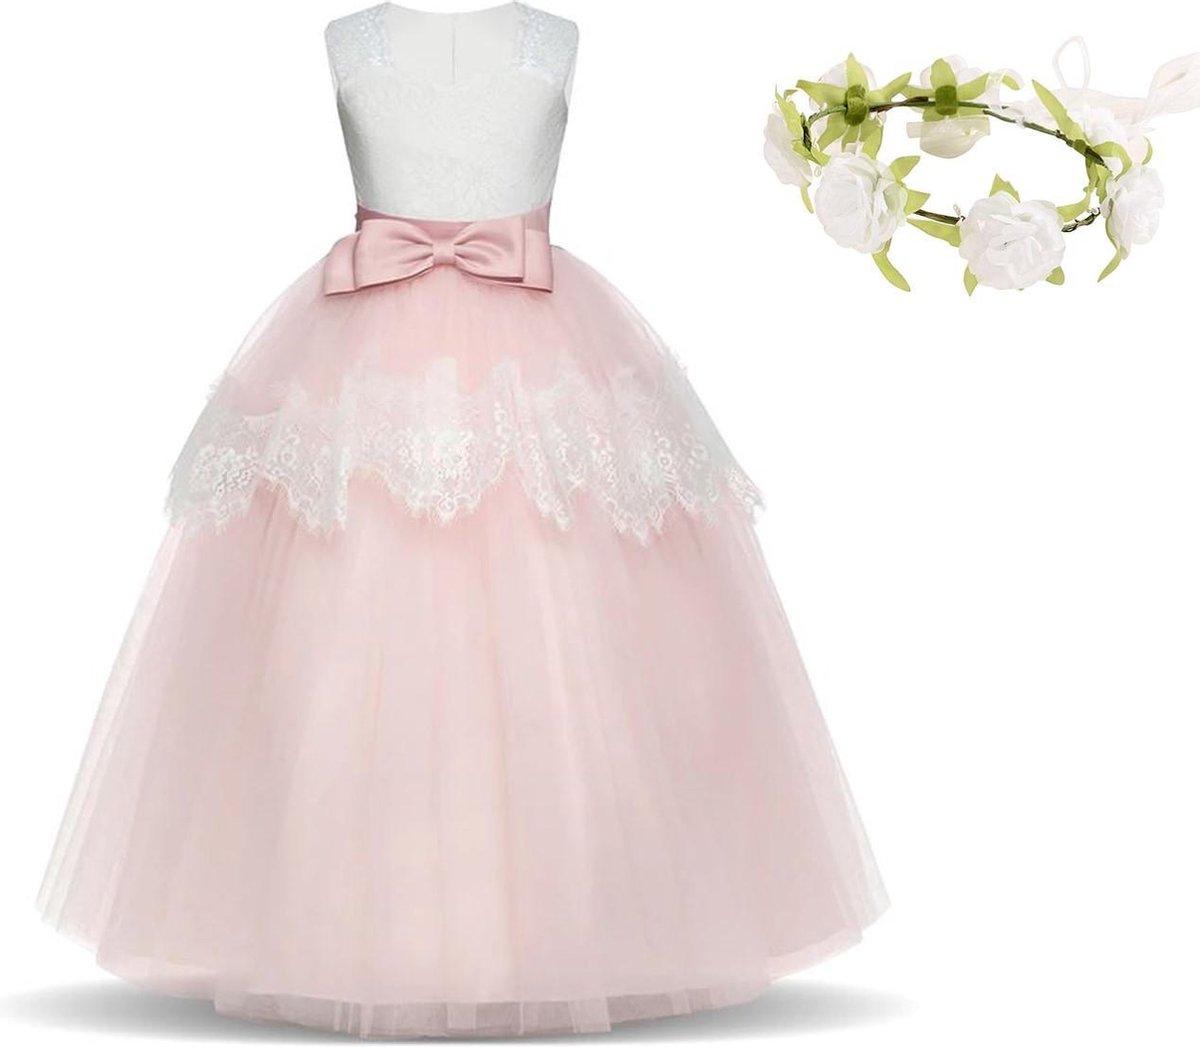 Communie jurk Bruidsmeisjes jurk roze wit Classic Deluxe 122-128 (130) prinsessen jurk feestjurk + b